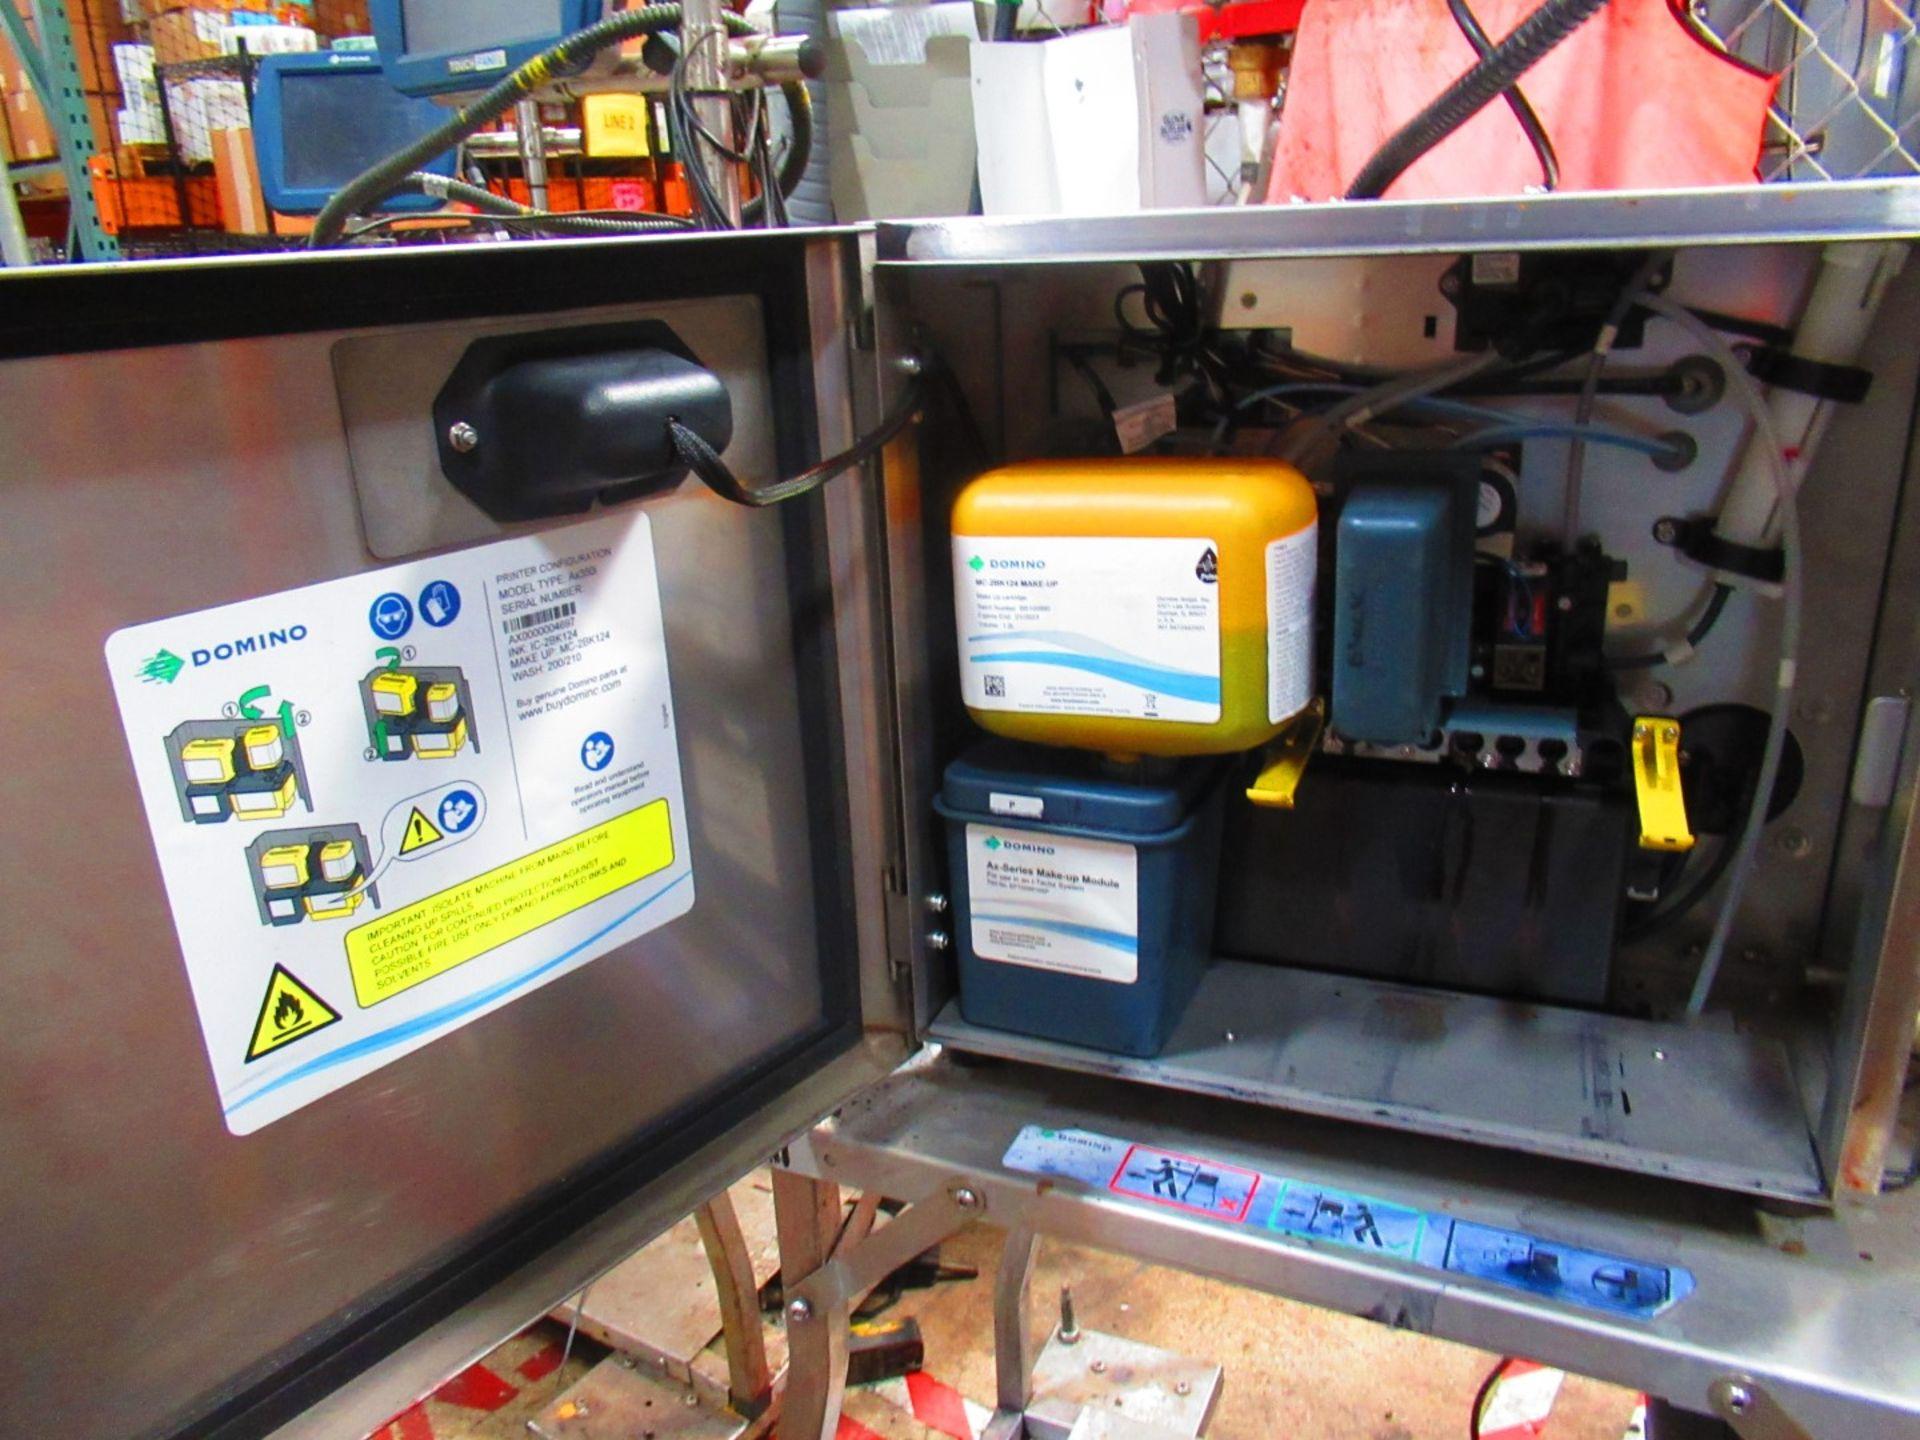 Thermal Printer - Image 4 of 7